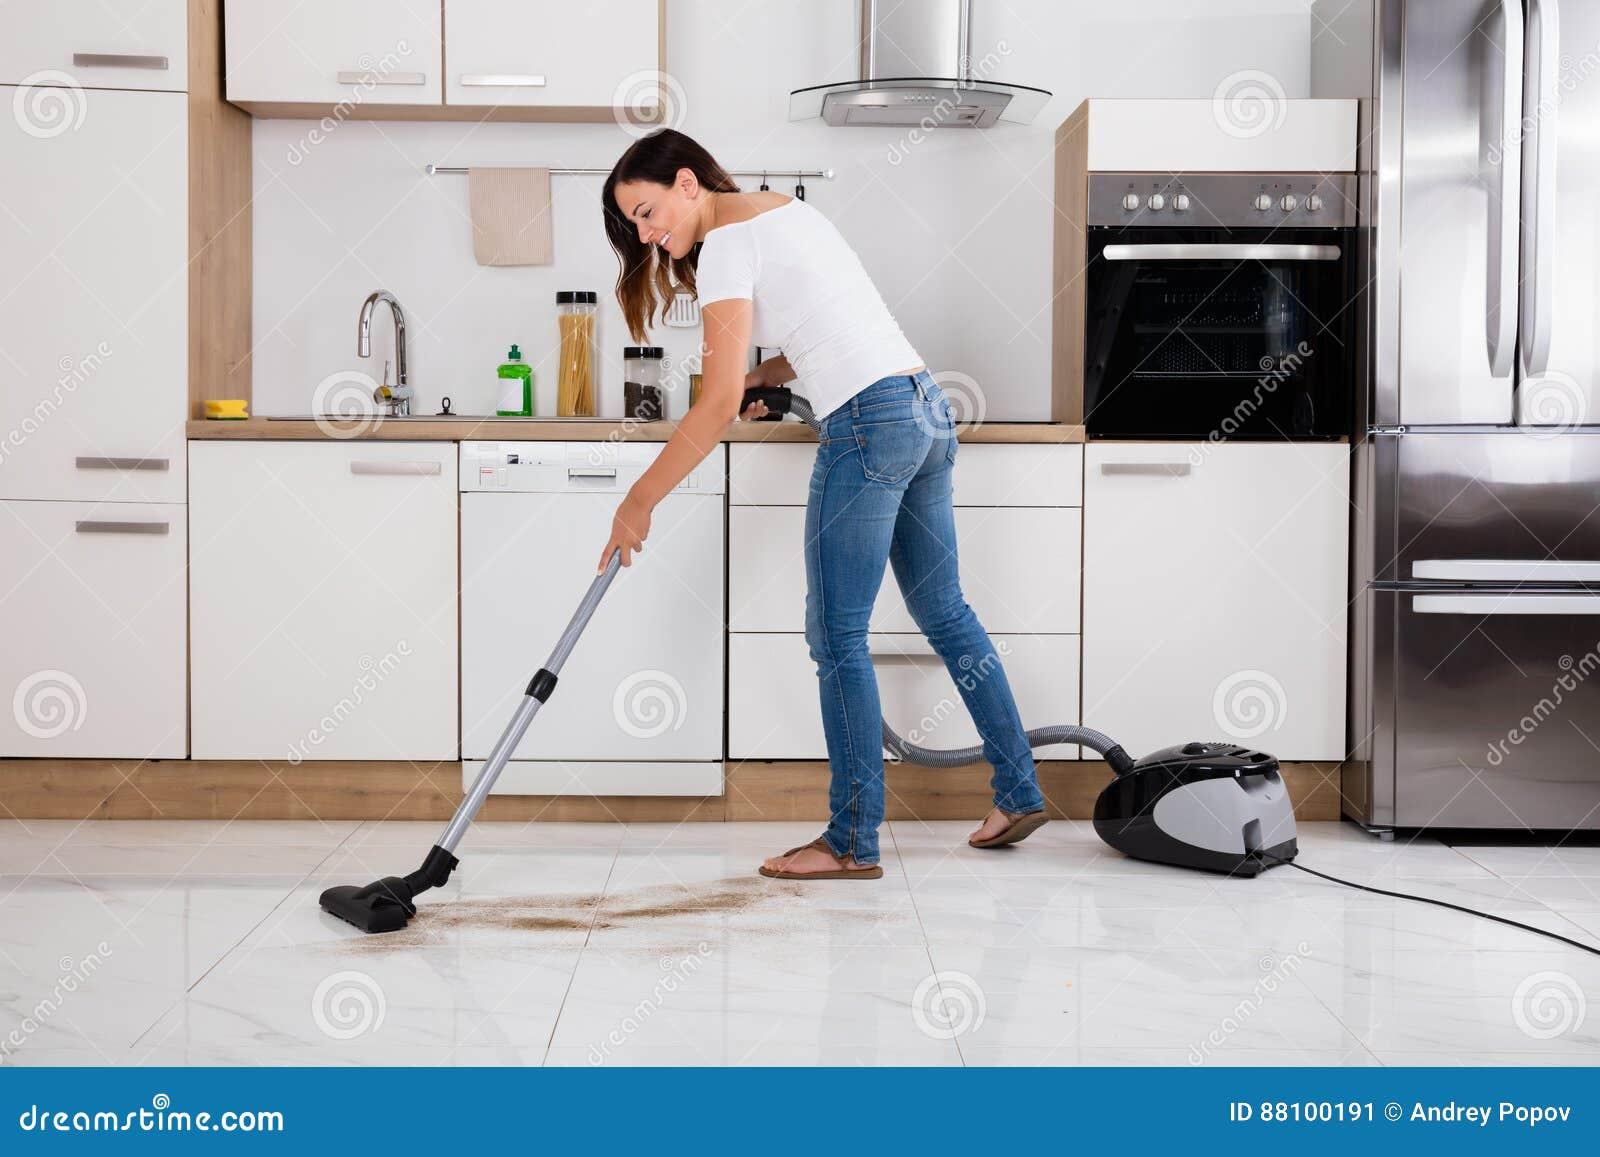 1fa19029bf2f Γυναίκα που καθαρίζει το πάτωμα σκόνης της κουζίνας Στοκ Εικόνα ...